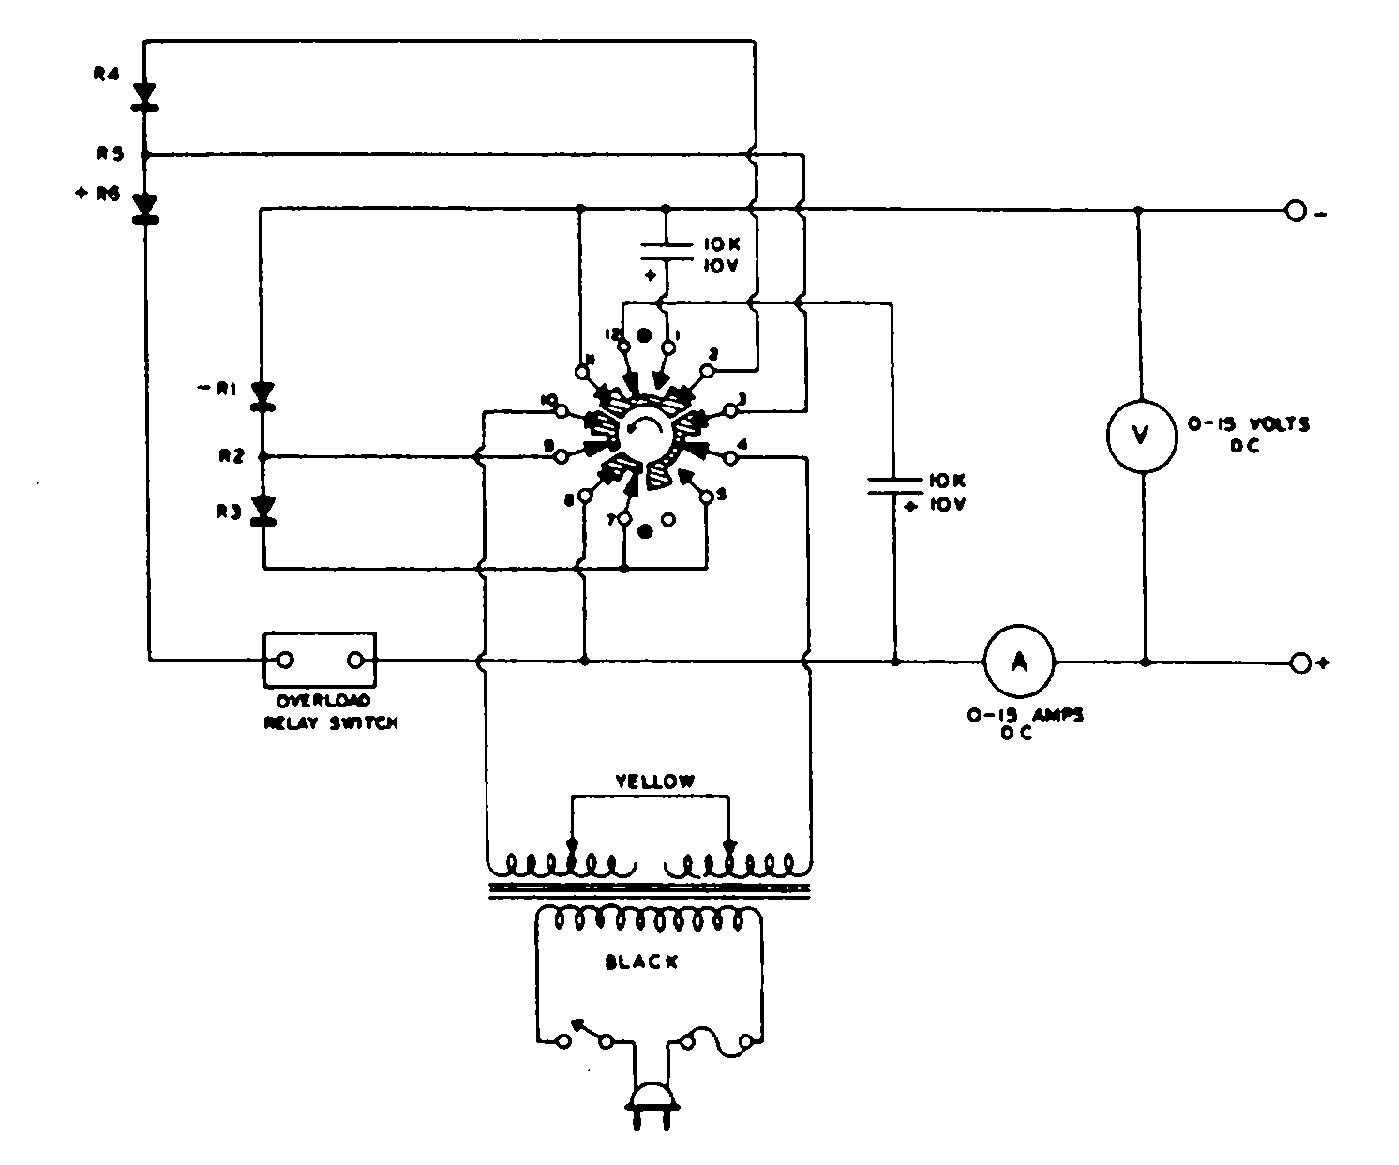 eliminator 011-1518-8 manual